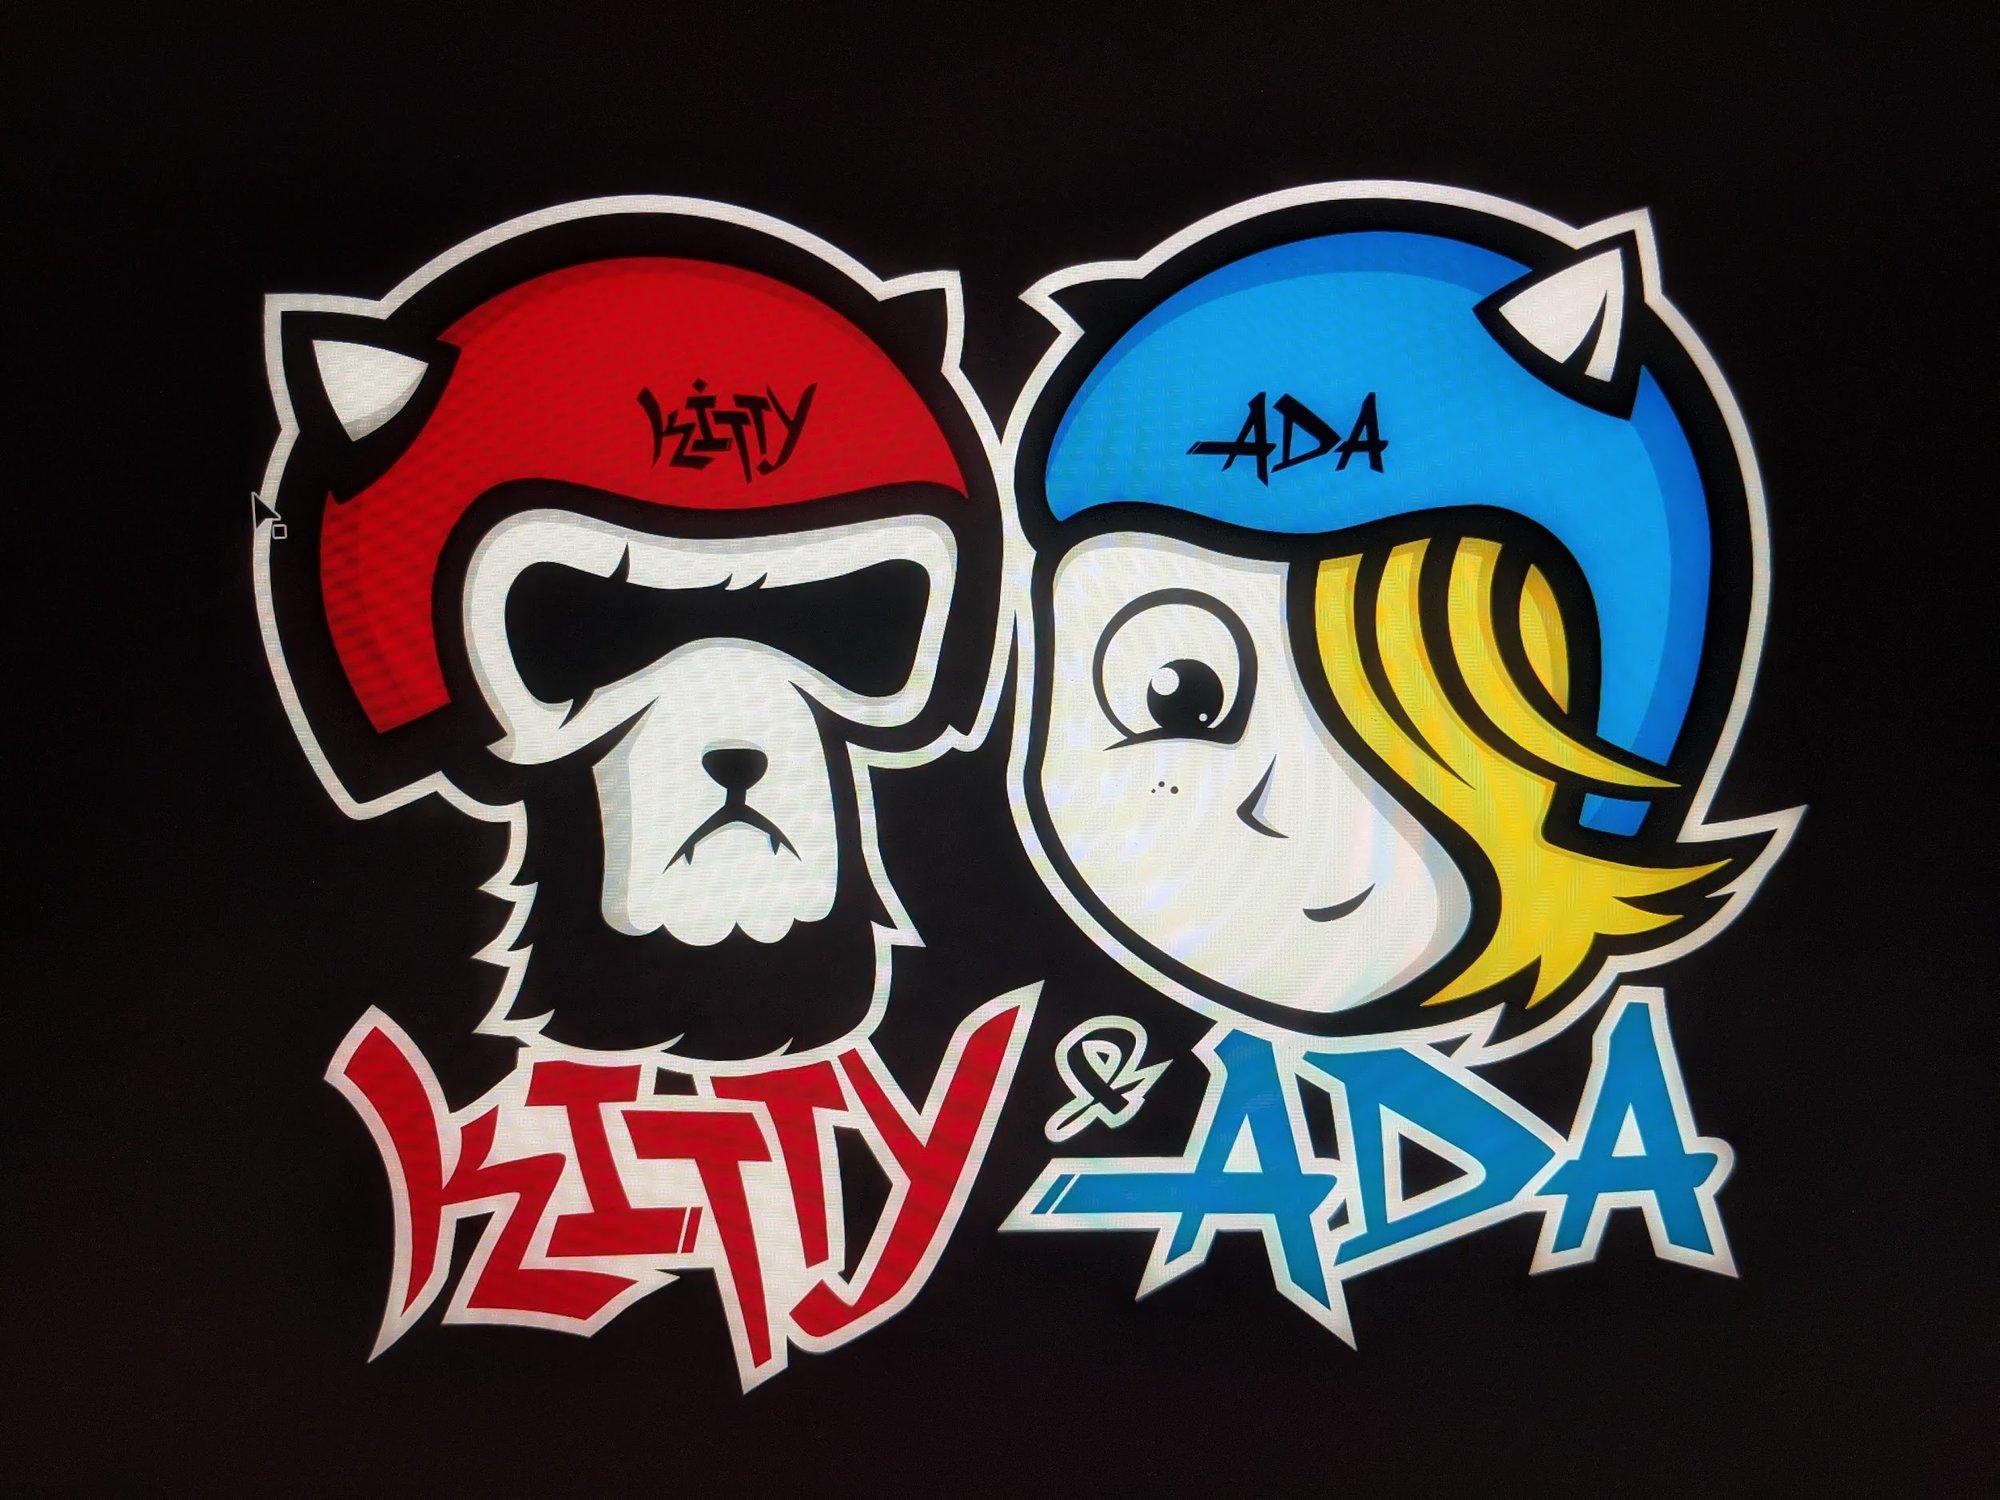 kitty-and-ada-logos.jpeg